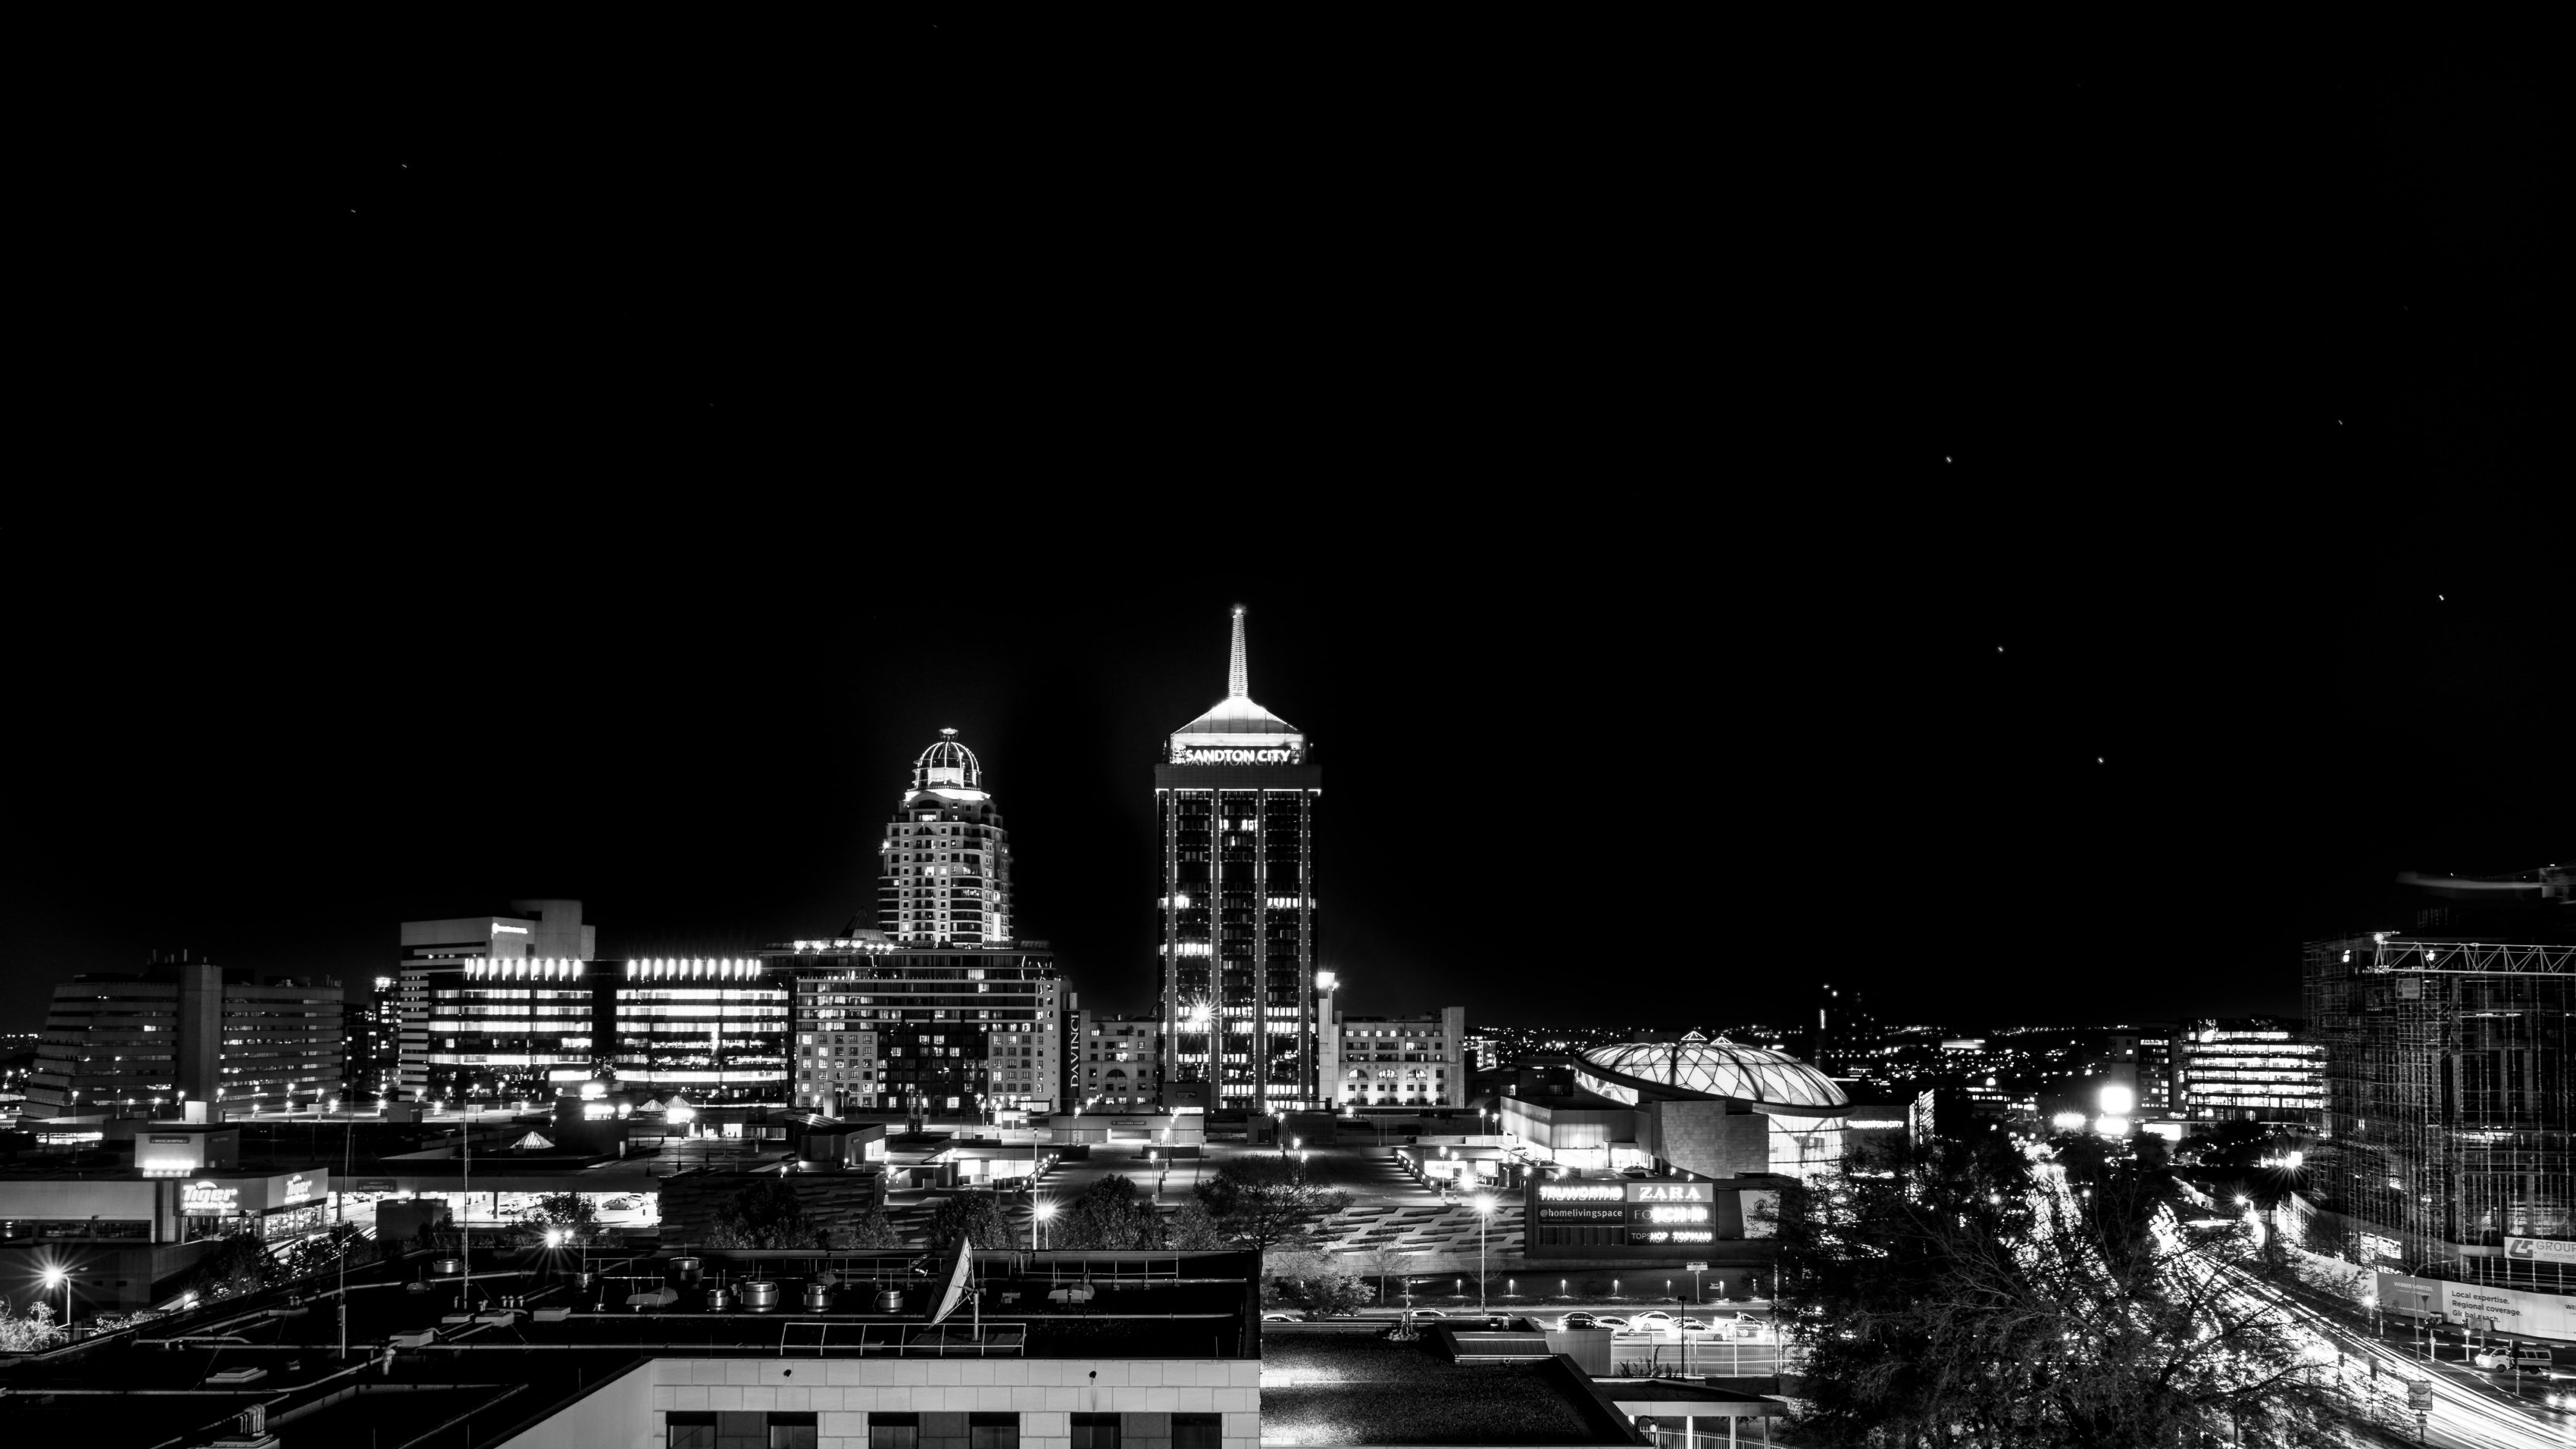 Sandton_City_at_night